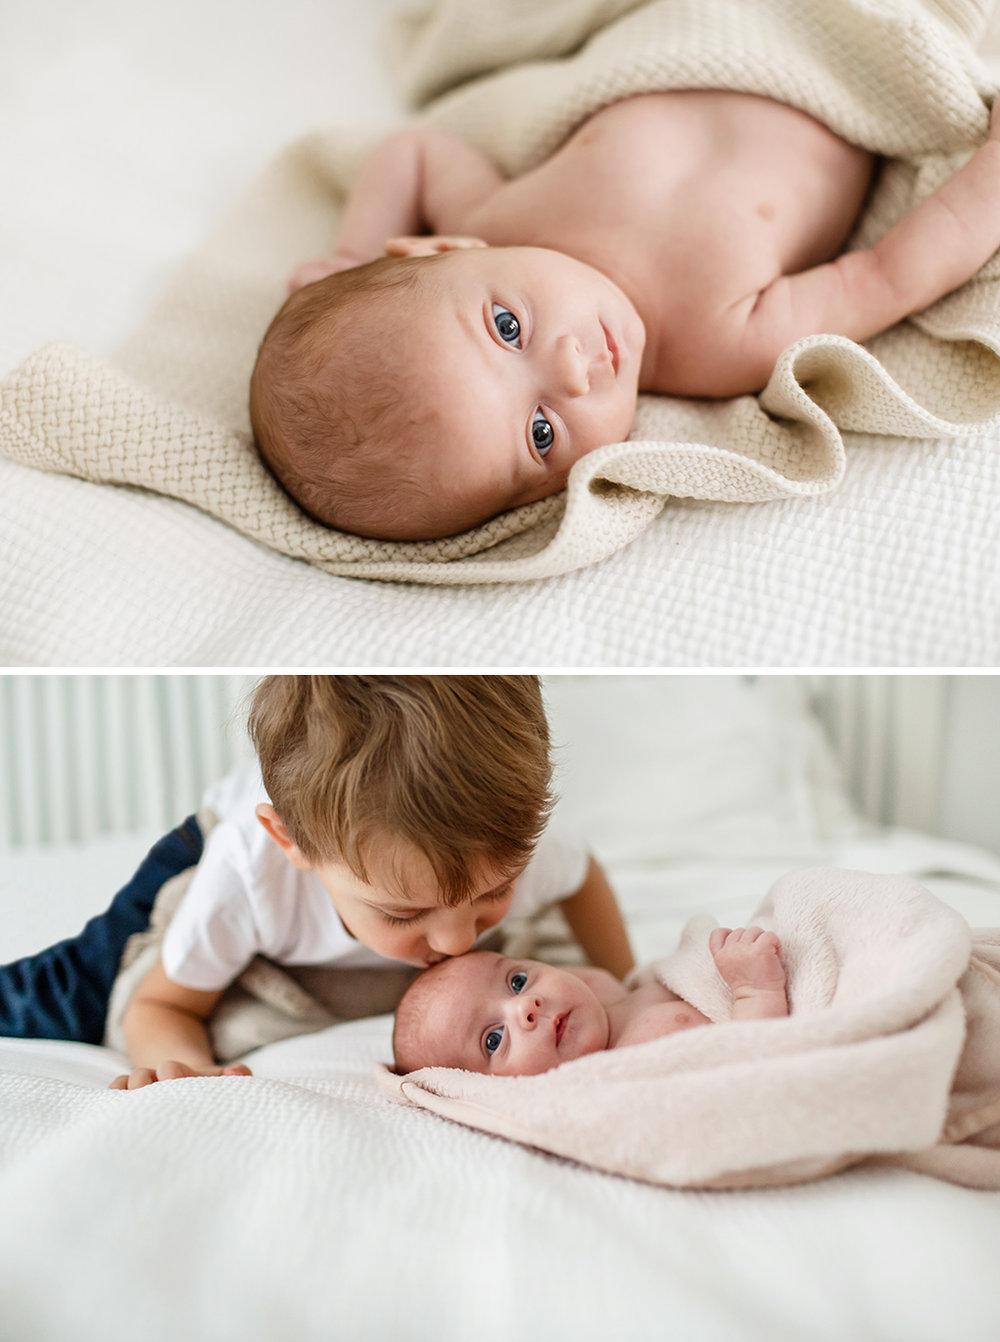 Lifestyle-nyfoddfotografering_newbornphotography_familjefotograf_Stockholm_5.jpg